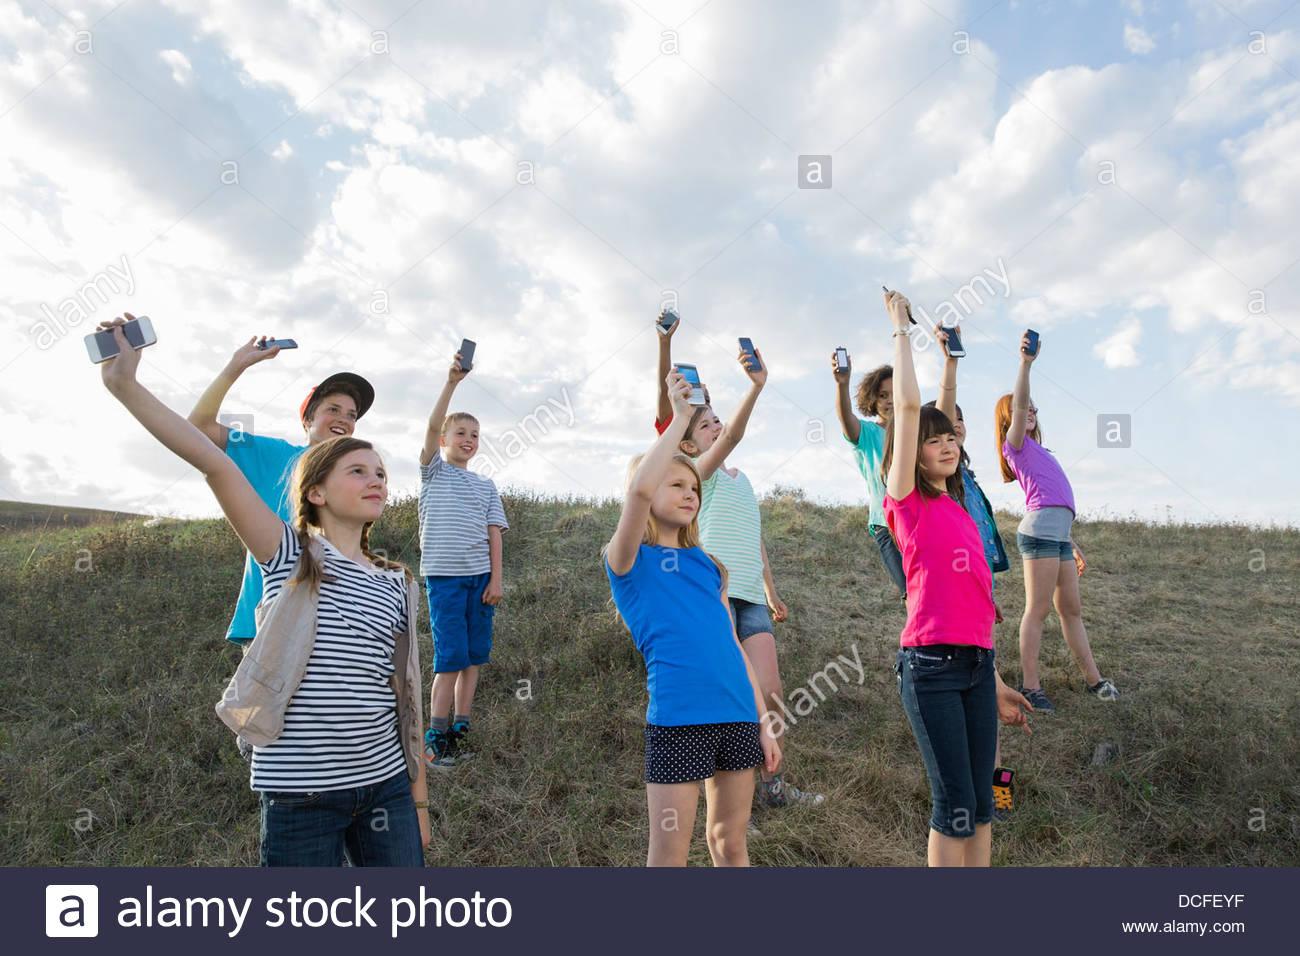 Schoolchildren holding mobile phones up - Stock Image